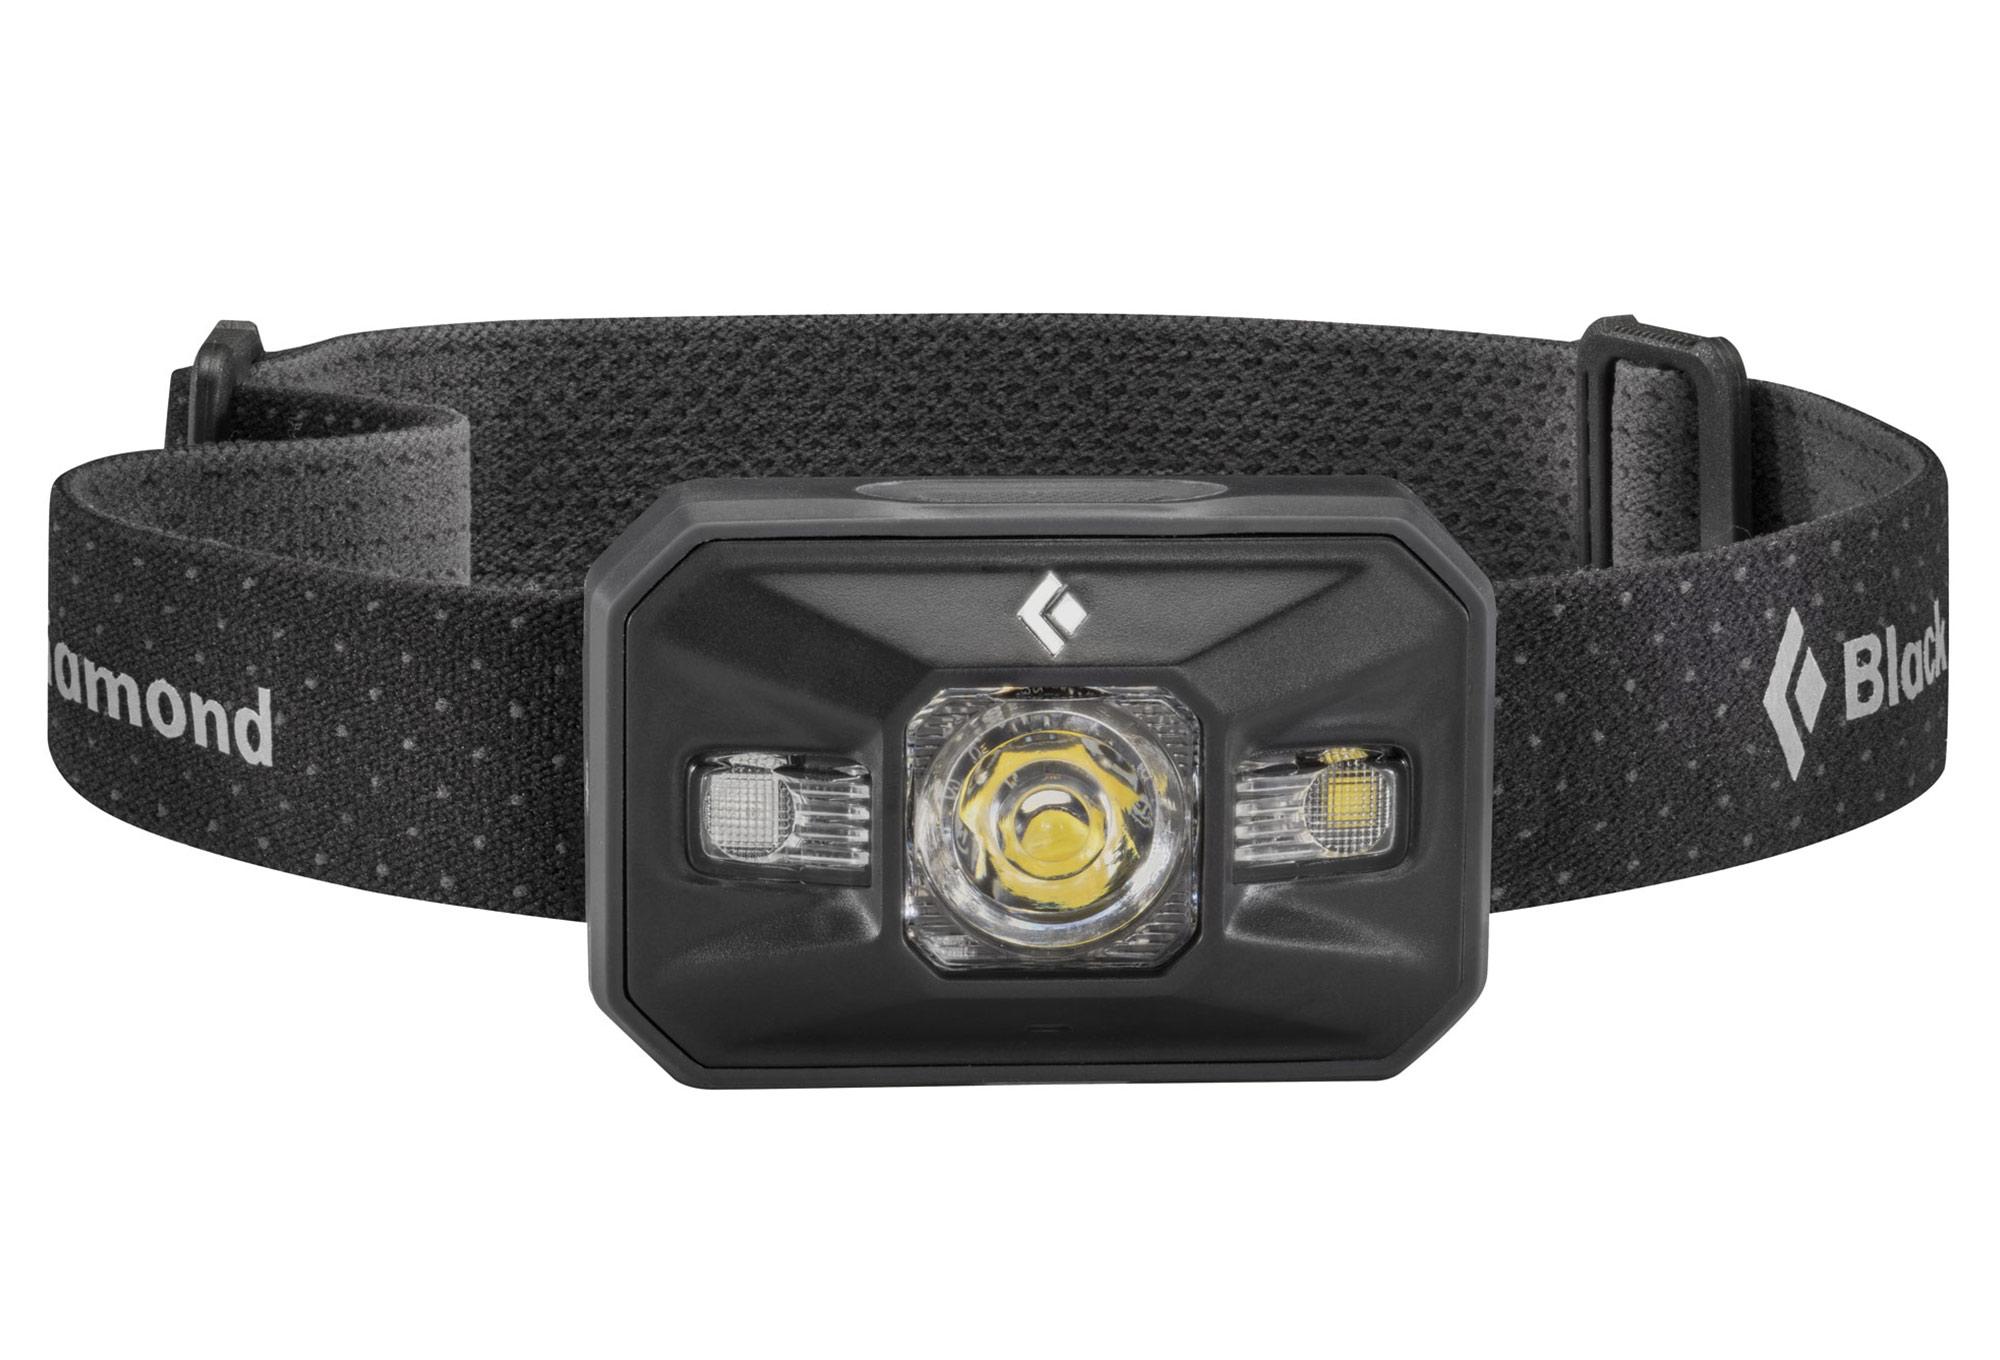 250 Lampe Frontale Diamond Lumens Noir Black Storm 7gyf6b